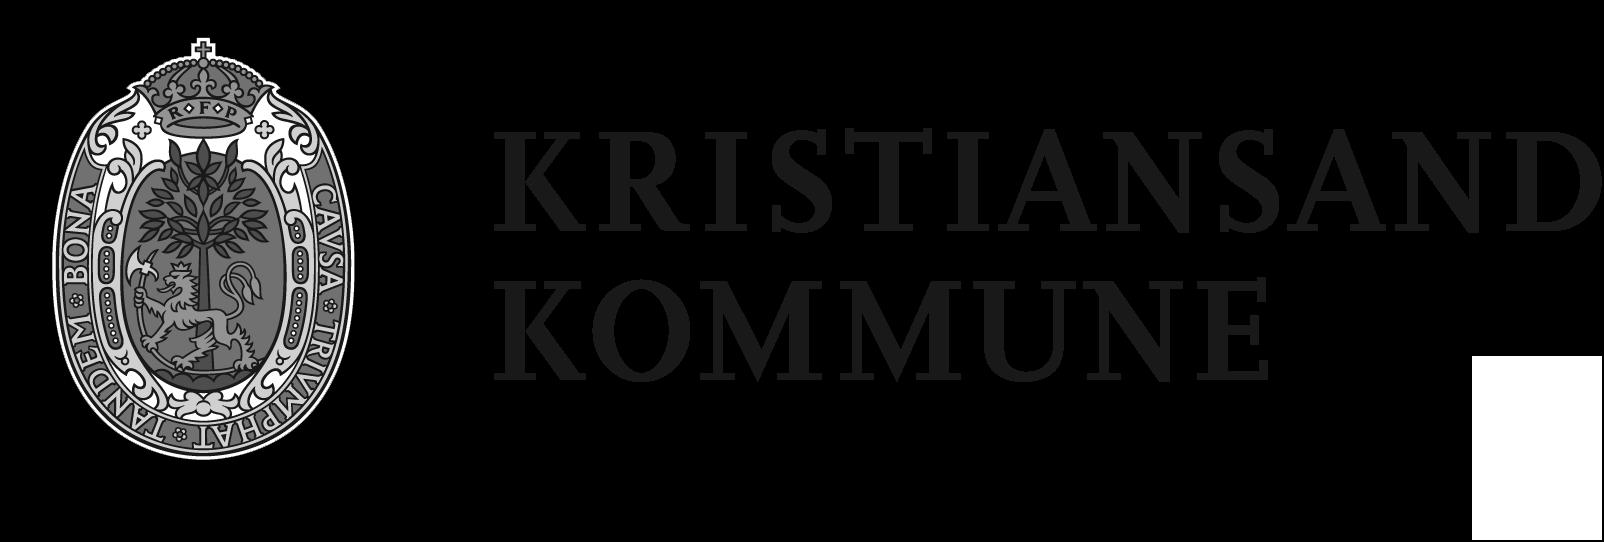 kristiansandSvart